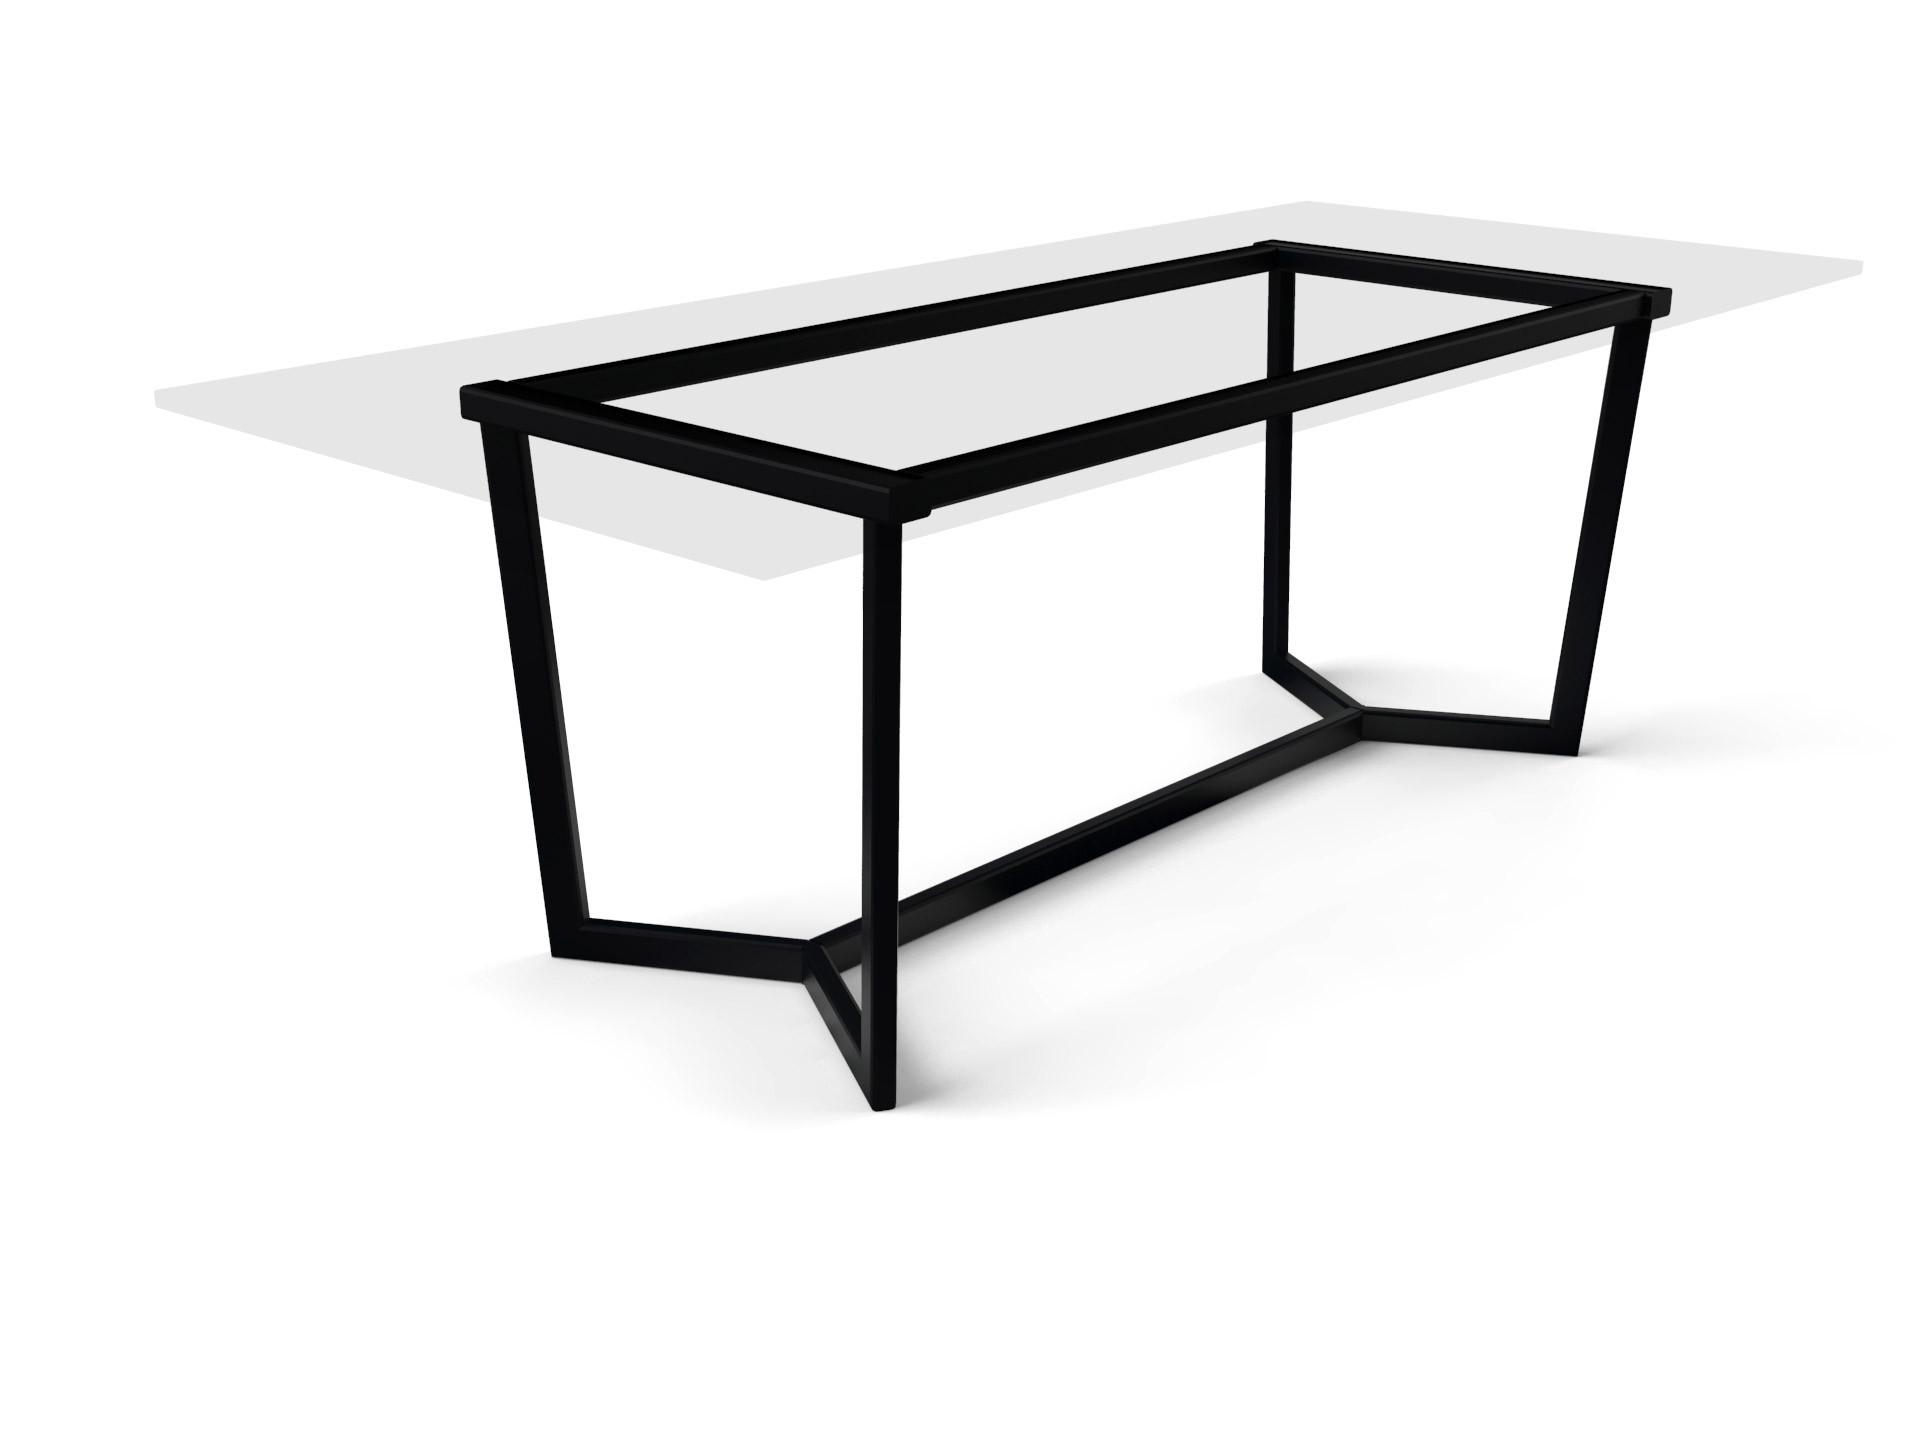 Tischgestell Formia